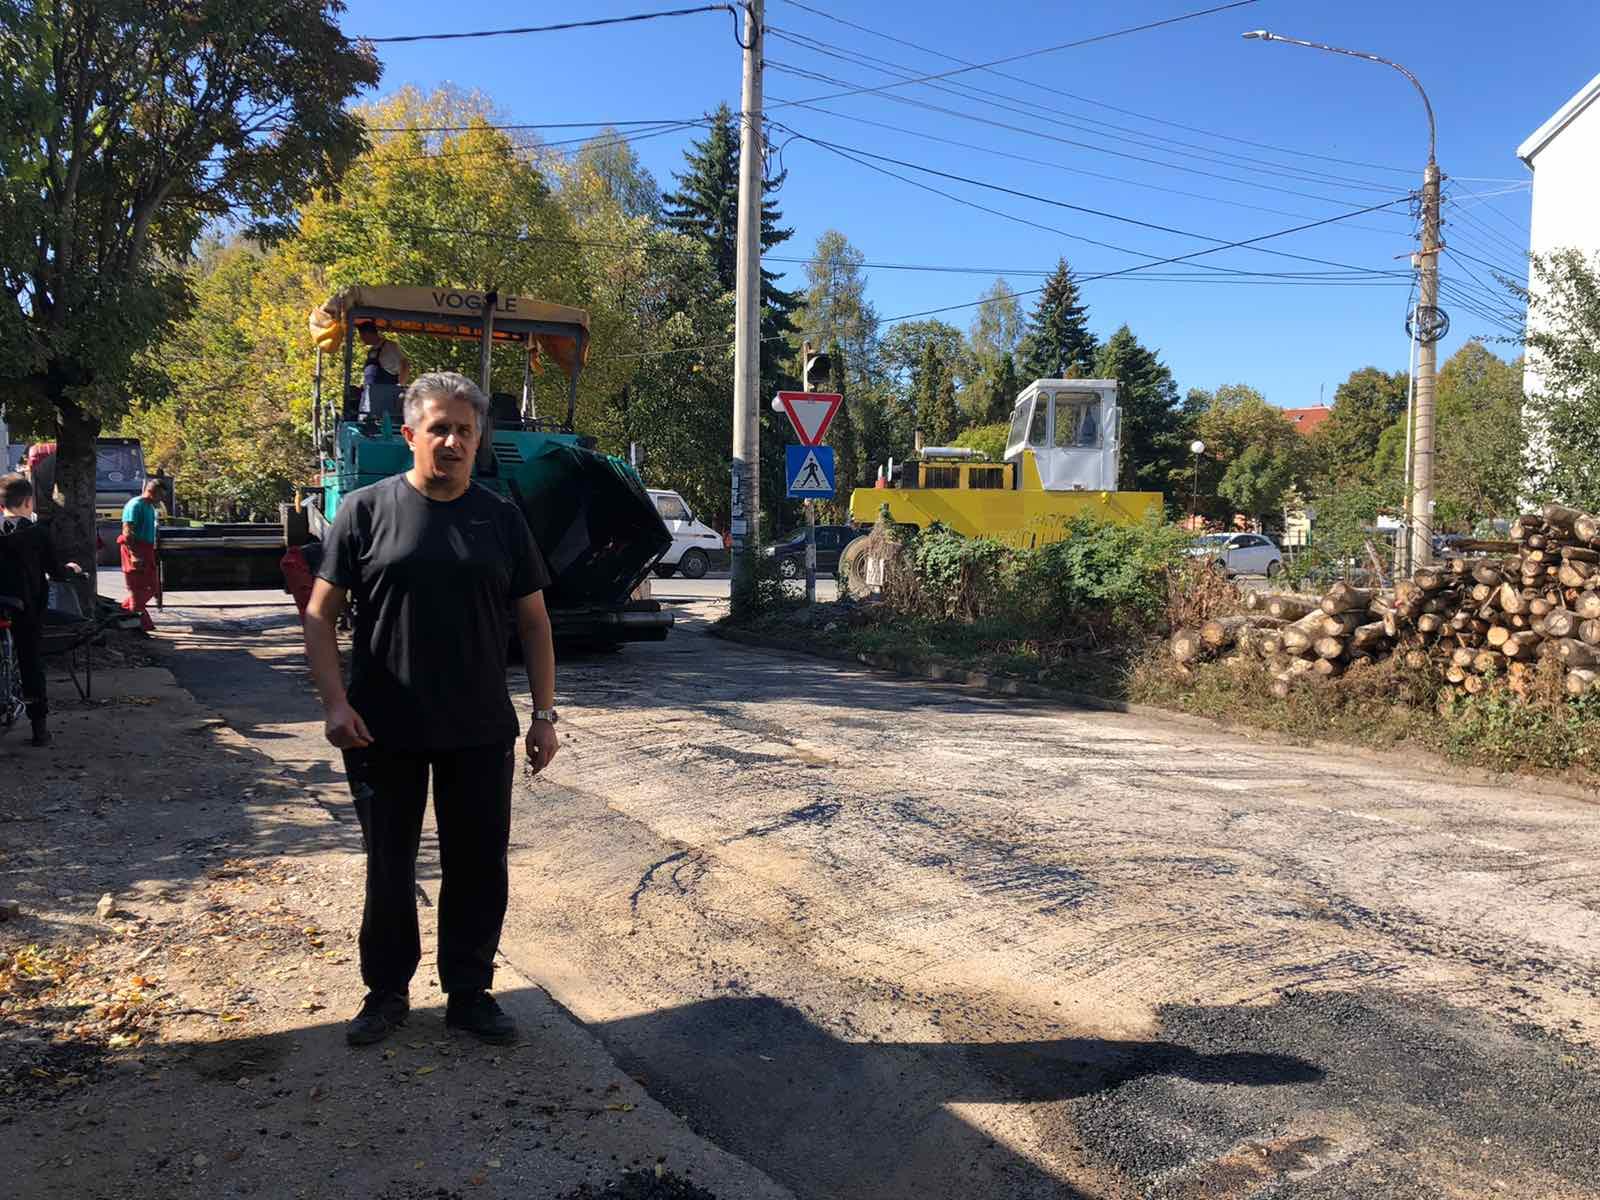 Narodni poslanik Milija Miletić obišao gradilište, foto: D.M.